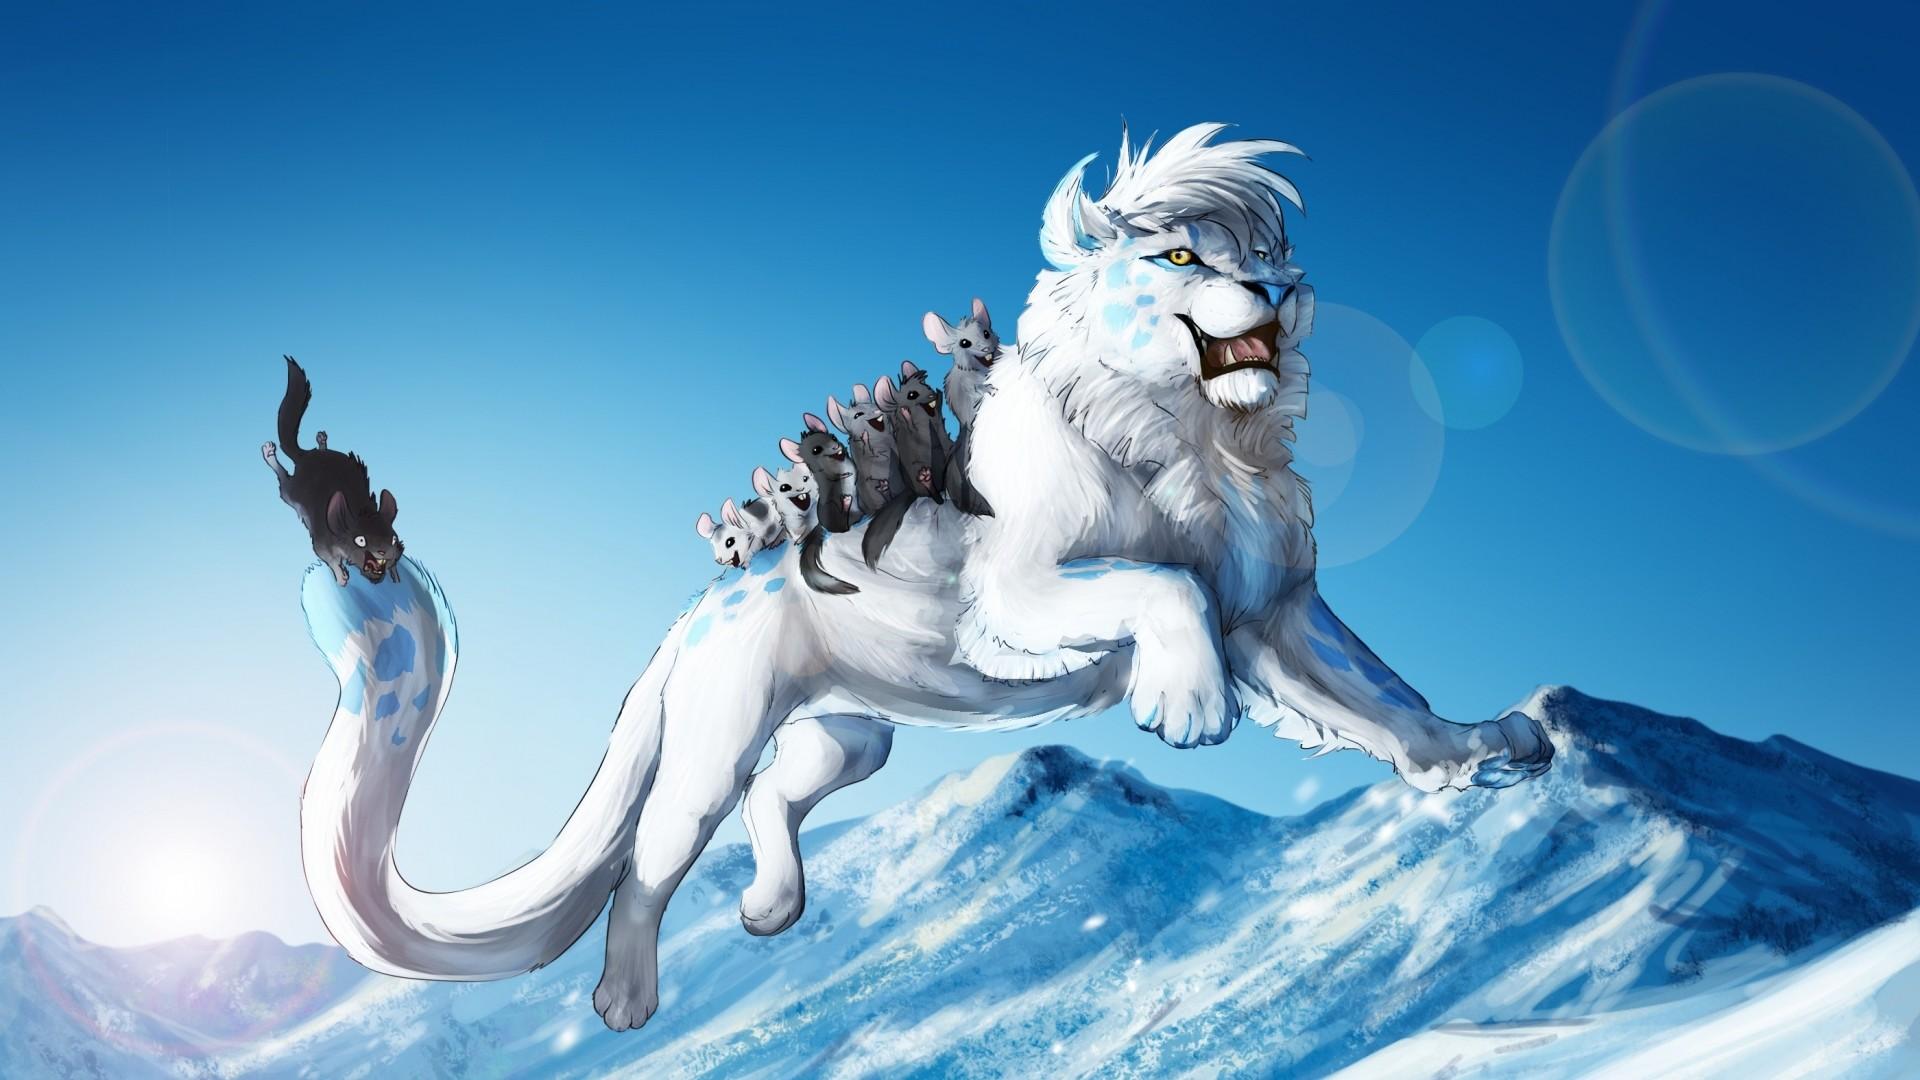 Wallpaper white lion, animals, games, fun, jump, winter, snow